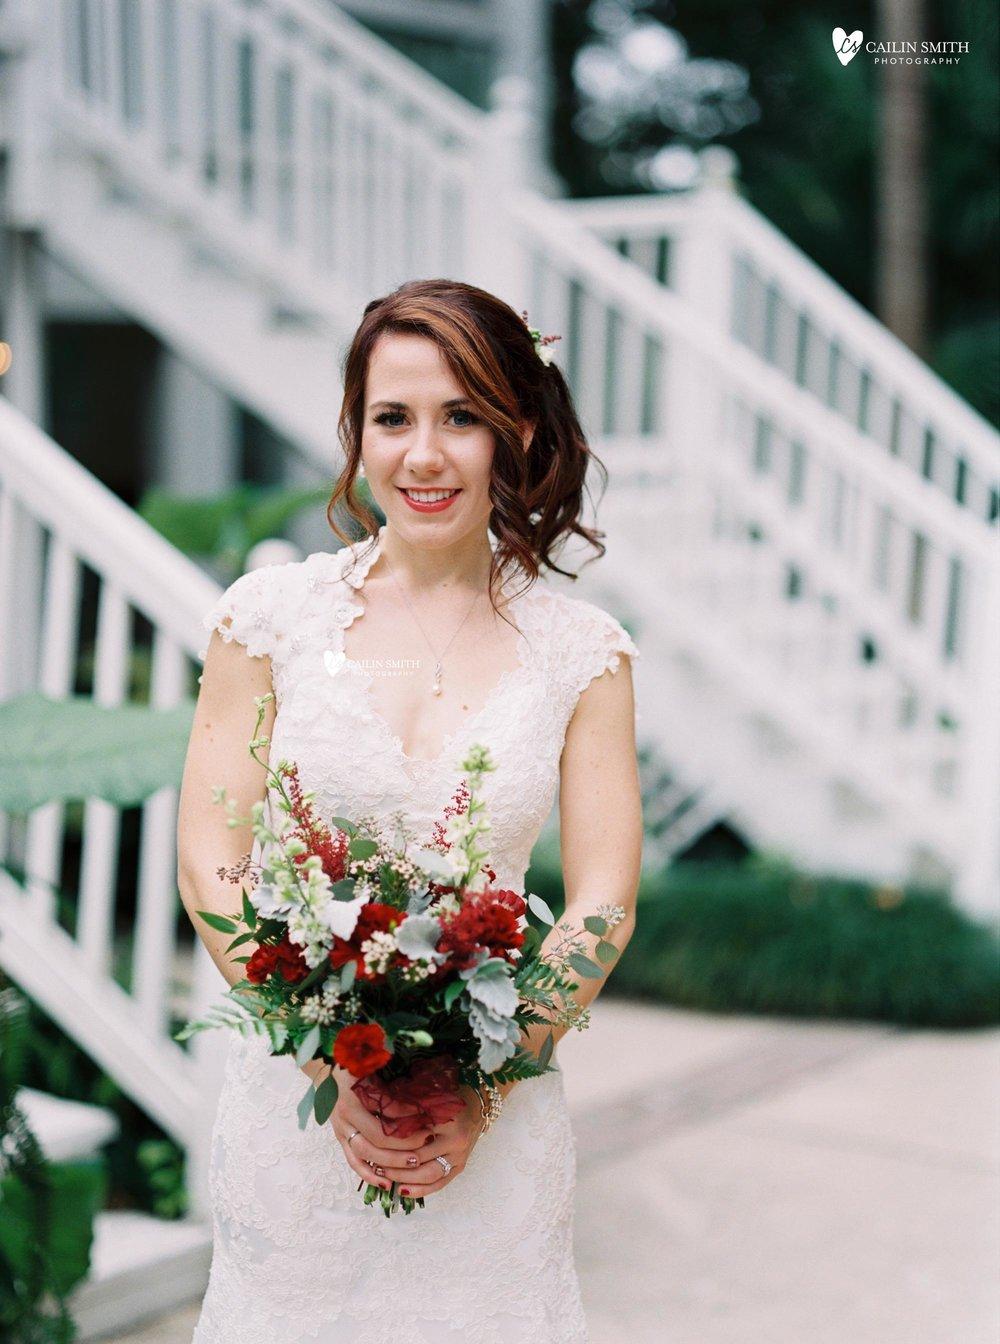 Shelby_Jeff_Ponte_Vedra_Hilltop_Club_Wedding_Photography_040.jpg